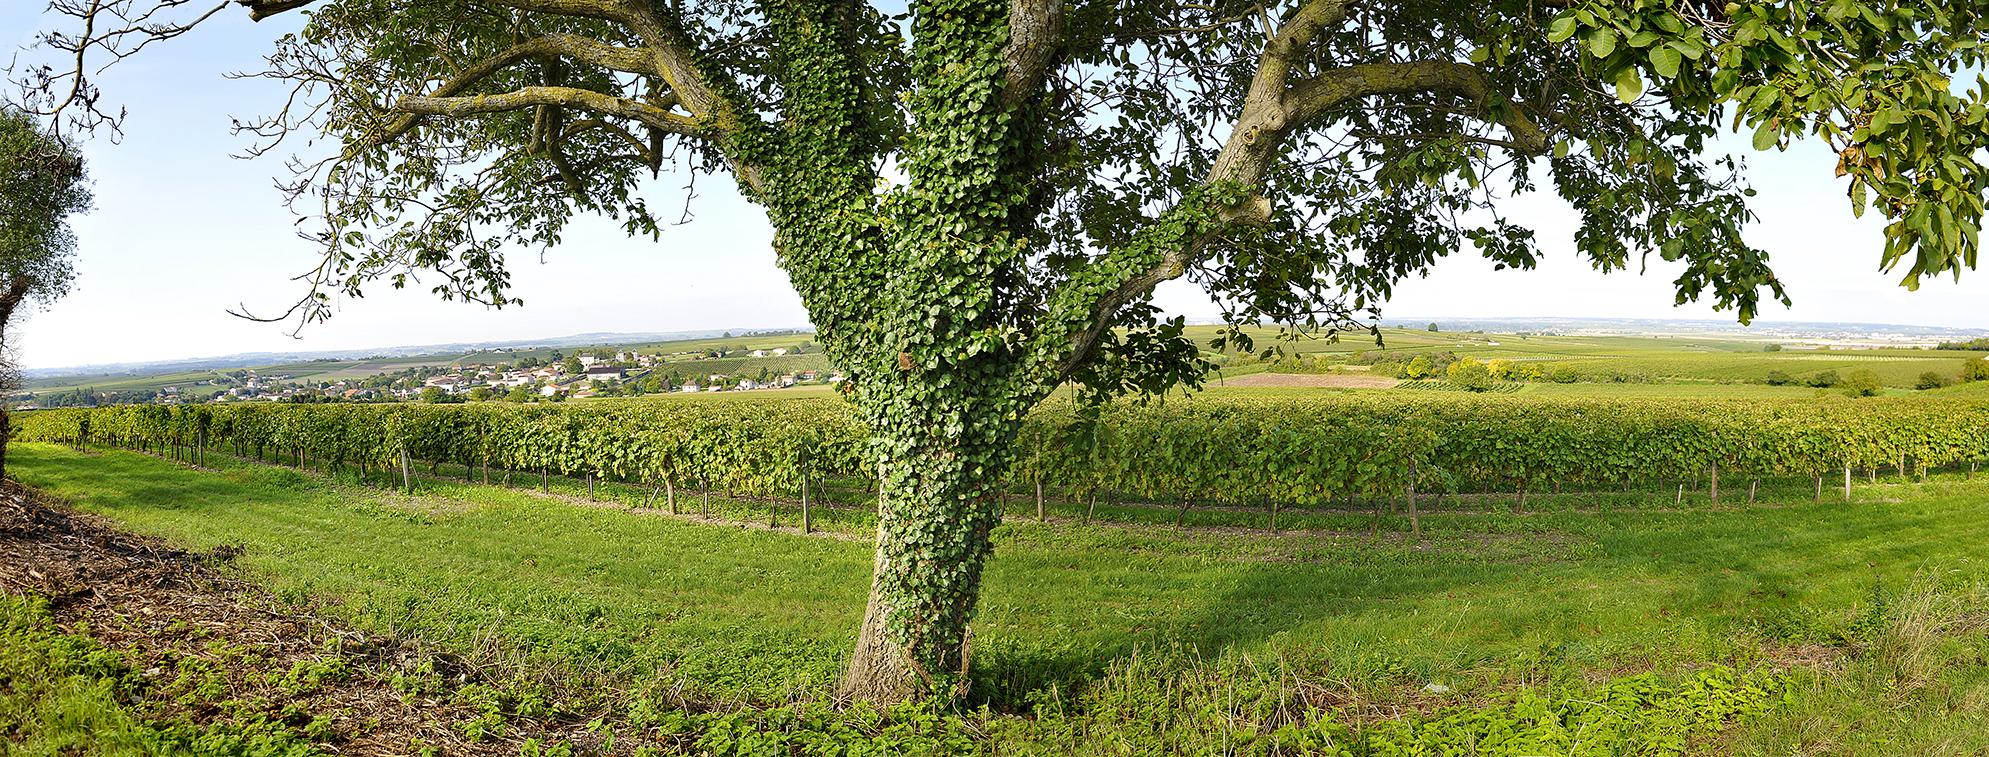 View of Drouet Vineyards